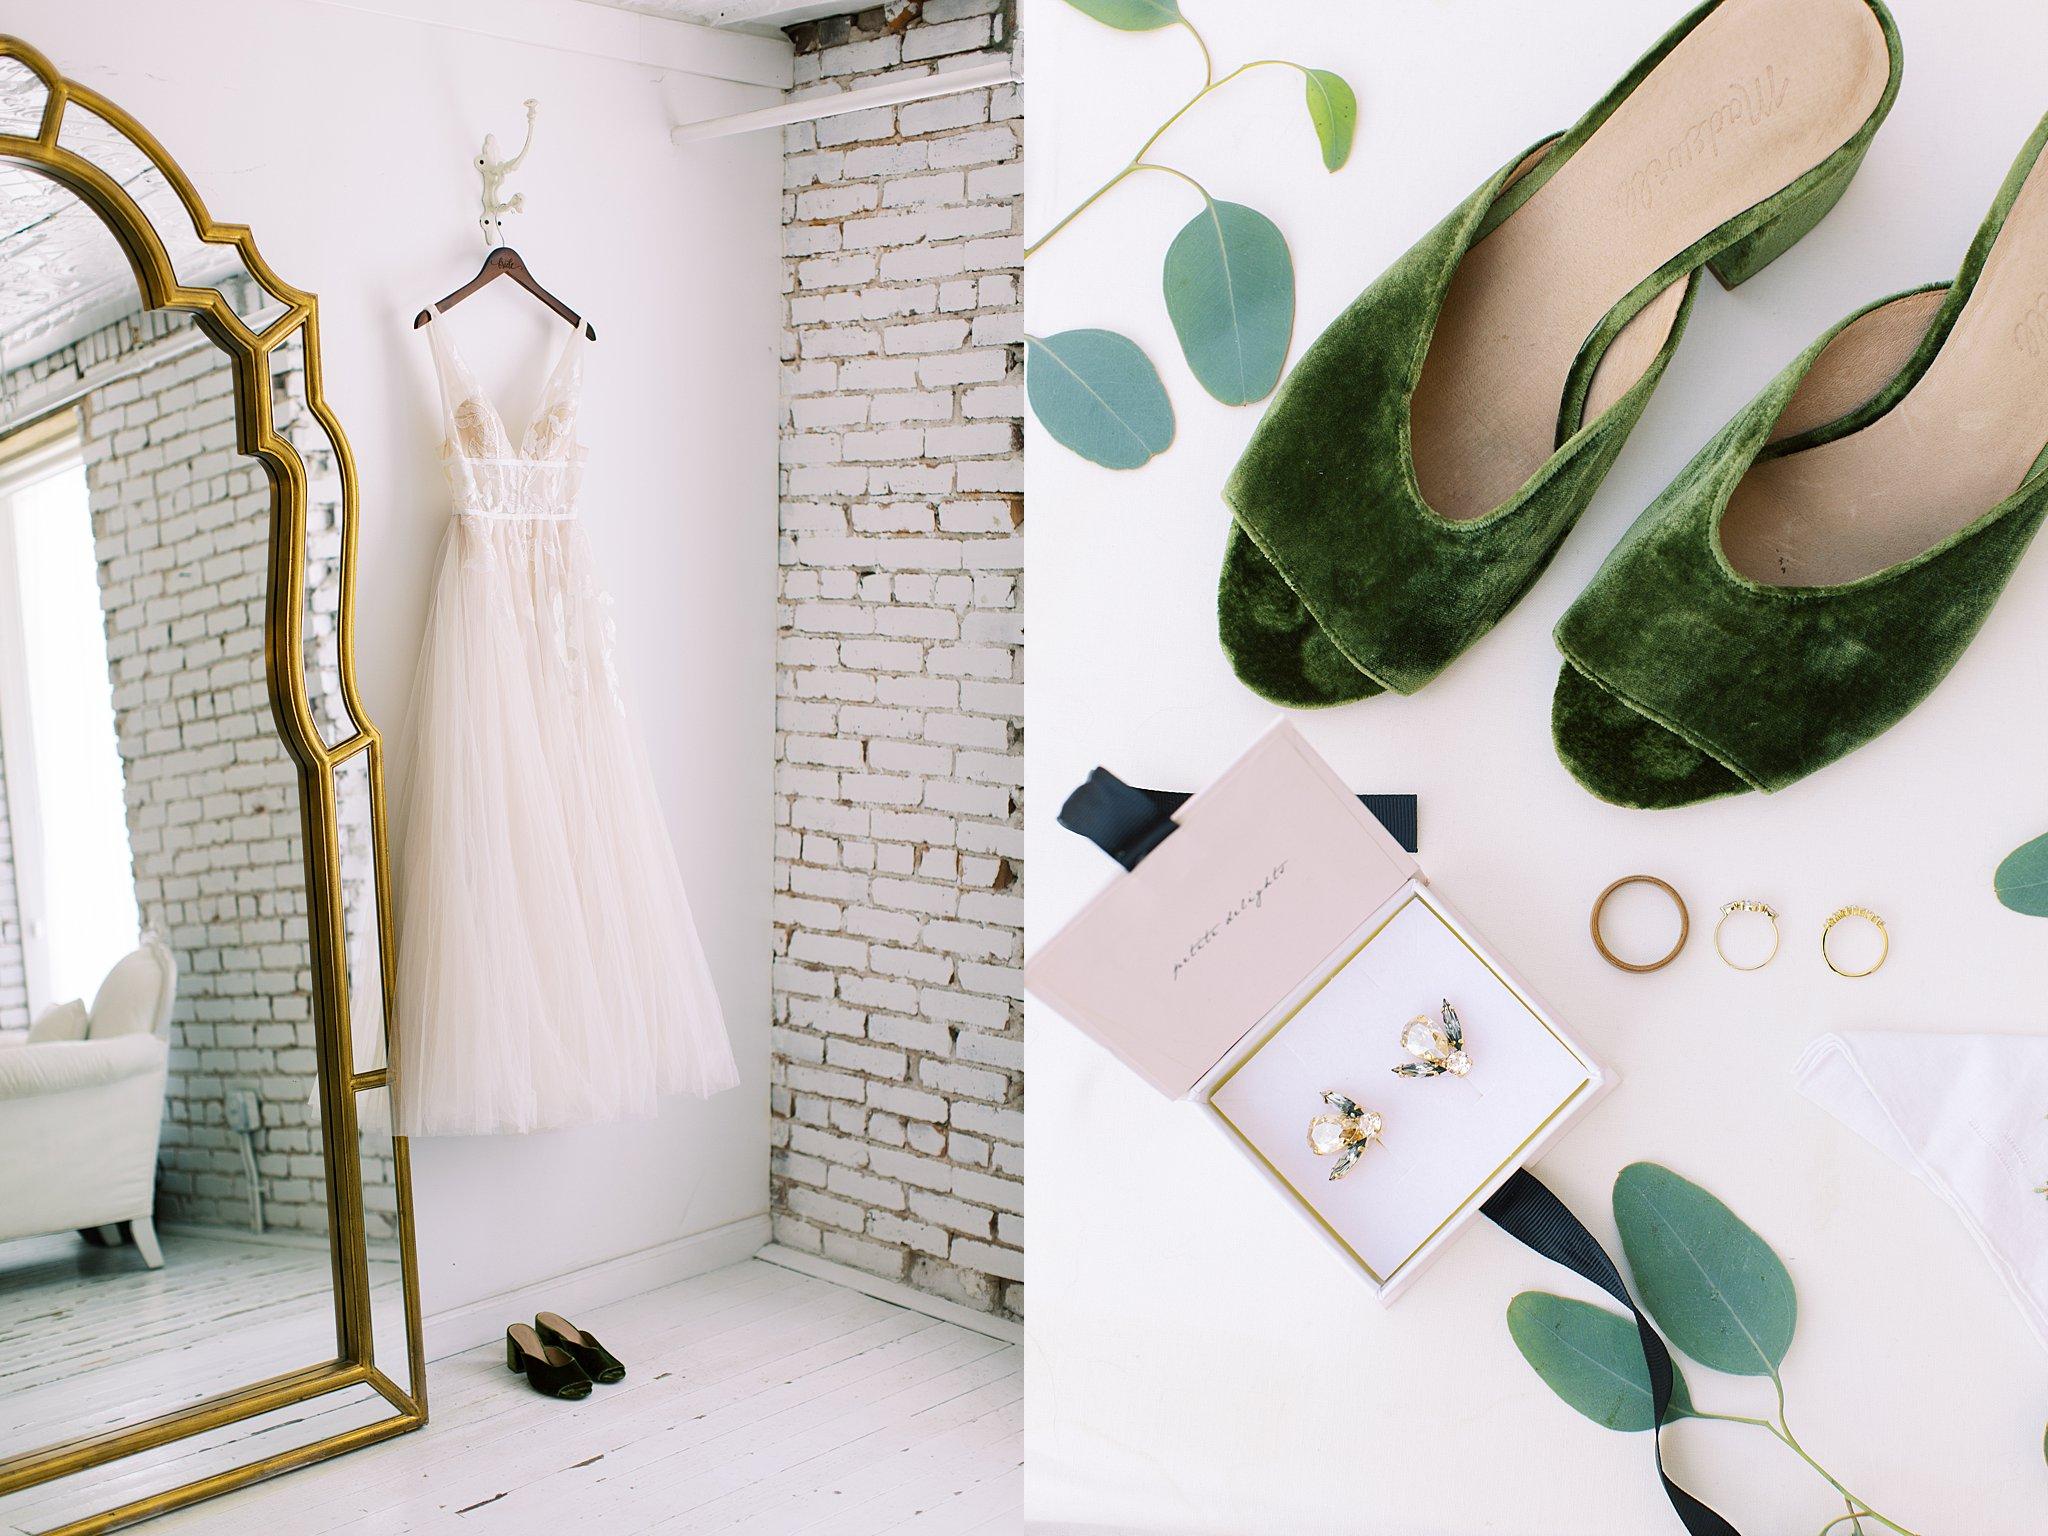 bhldn dress hanging and madewell green velvet shoes